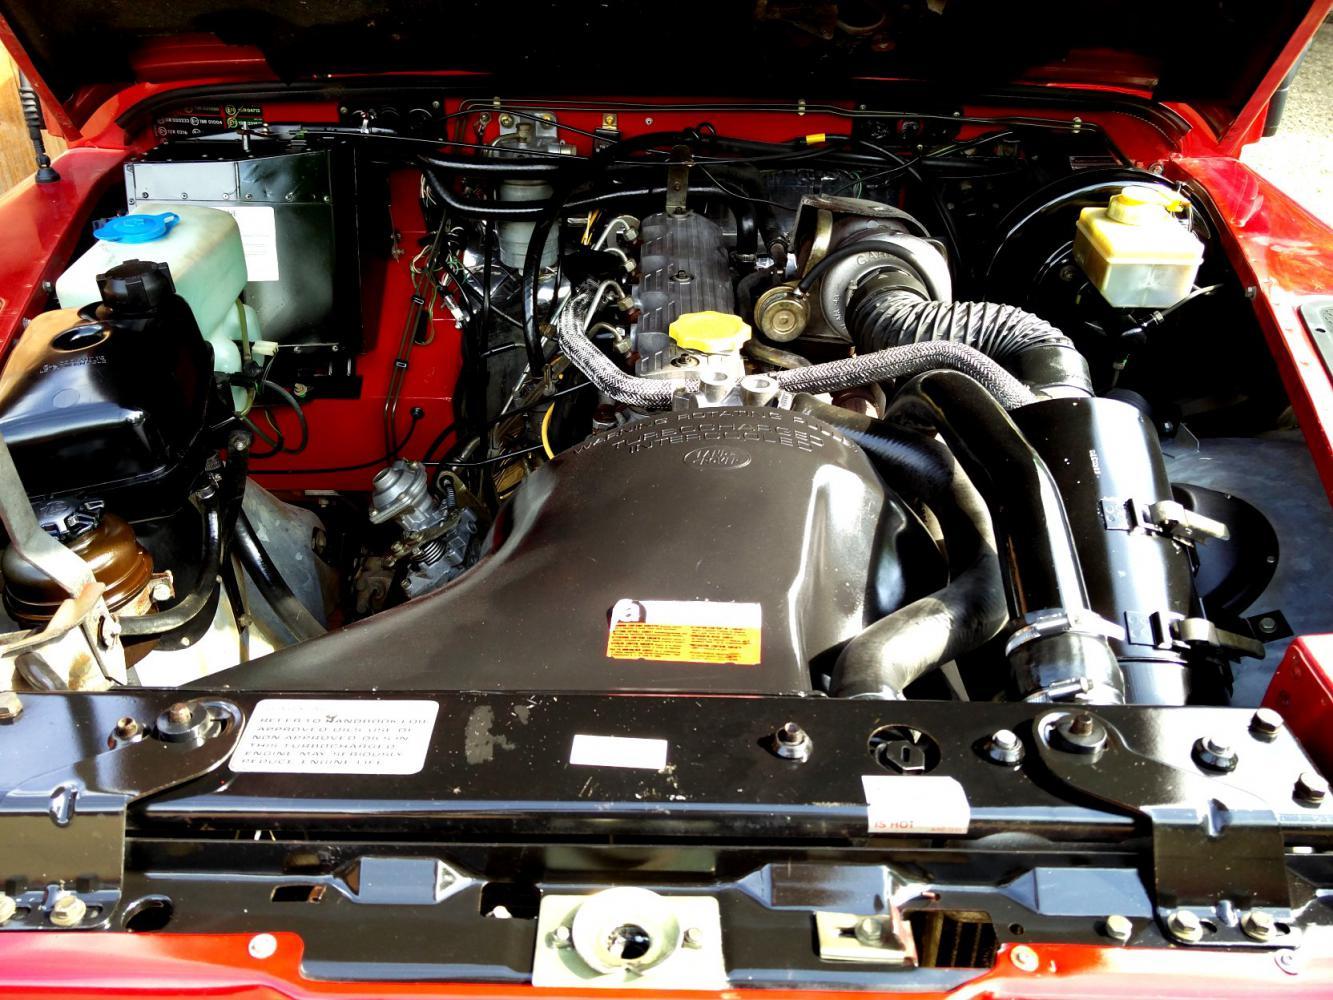 Click image for larger version  Name:1992 LR LHD Defender 90 Red 200 Tdi engine bay.jpg Views:166 Size:210.1 KB ID:263738